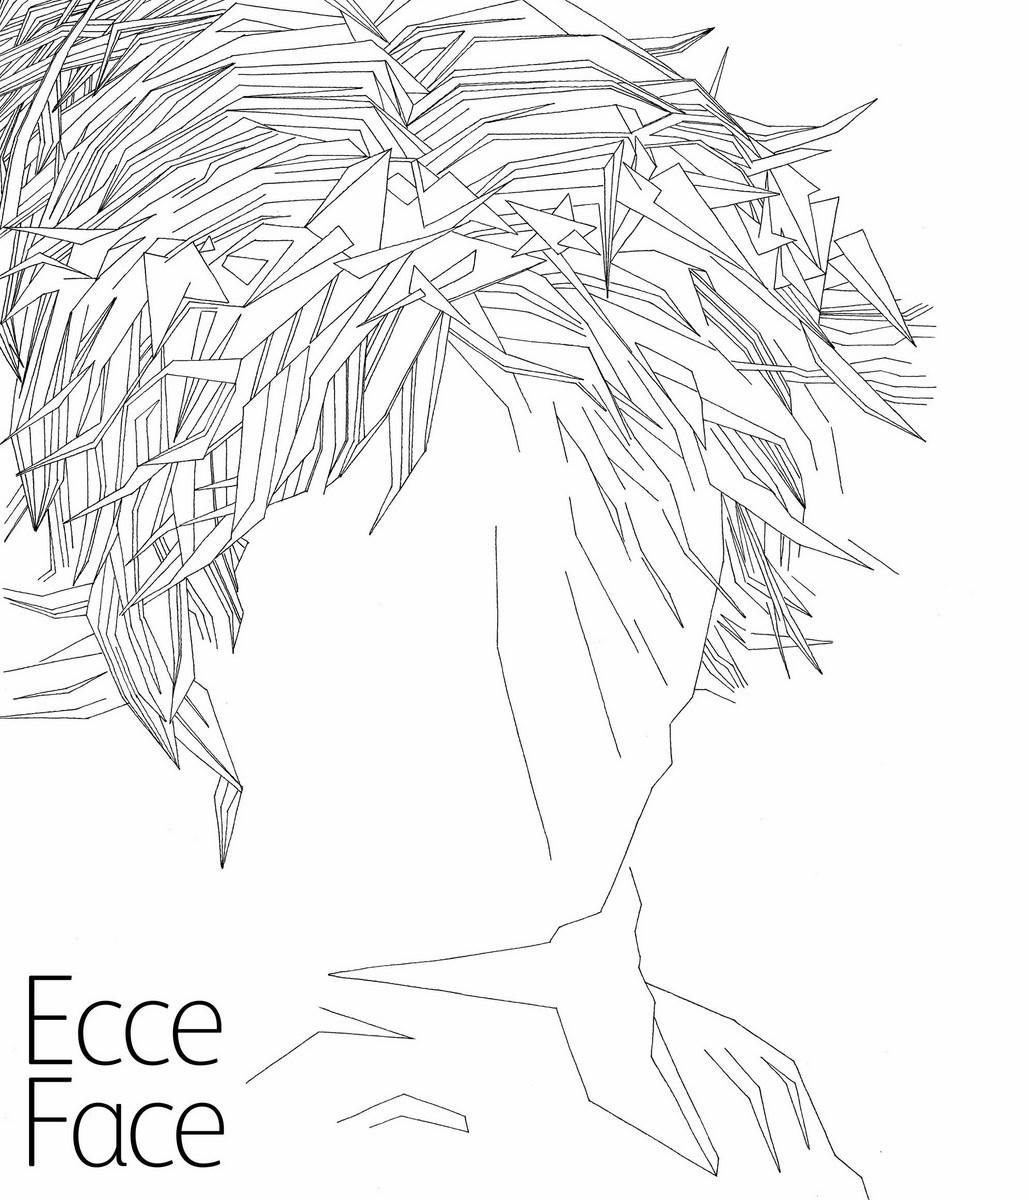 "Mateusz Pęk, ""Ecce Face"" (źródło: materiały prasowe organizatora)"